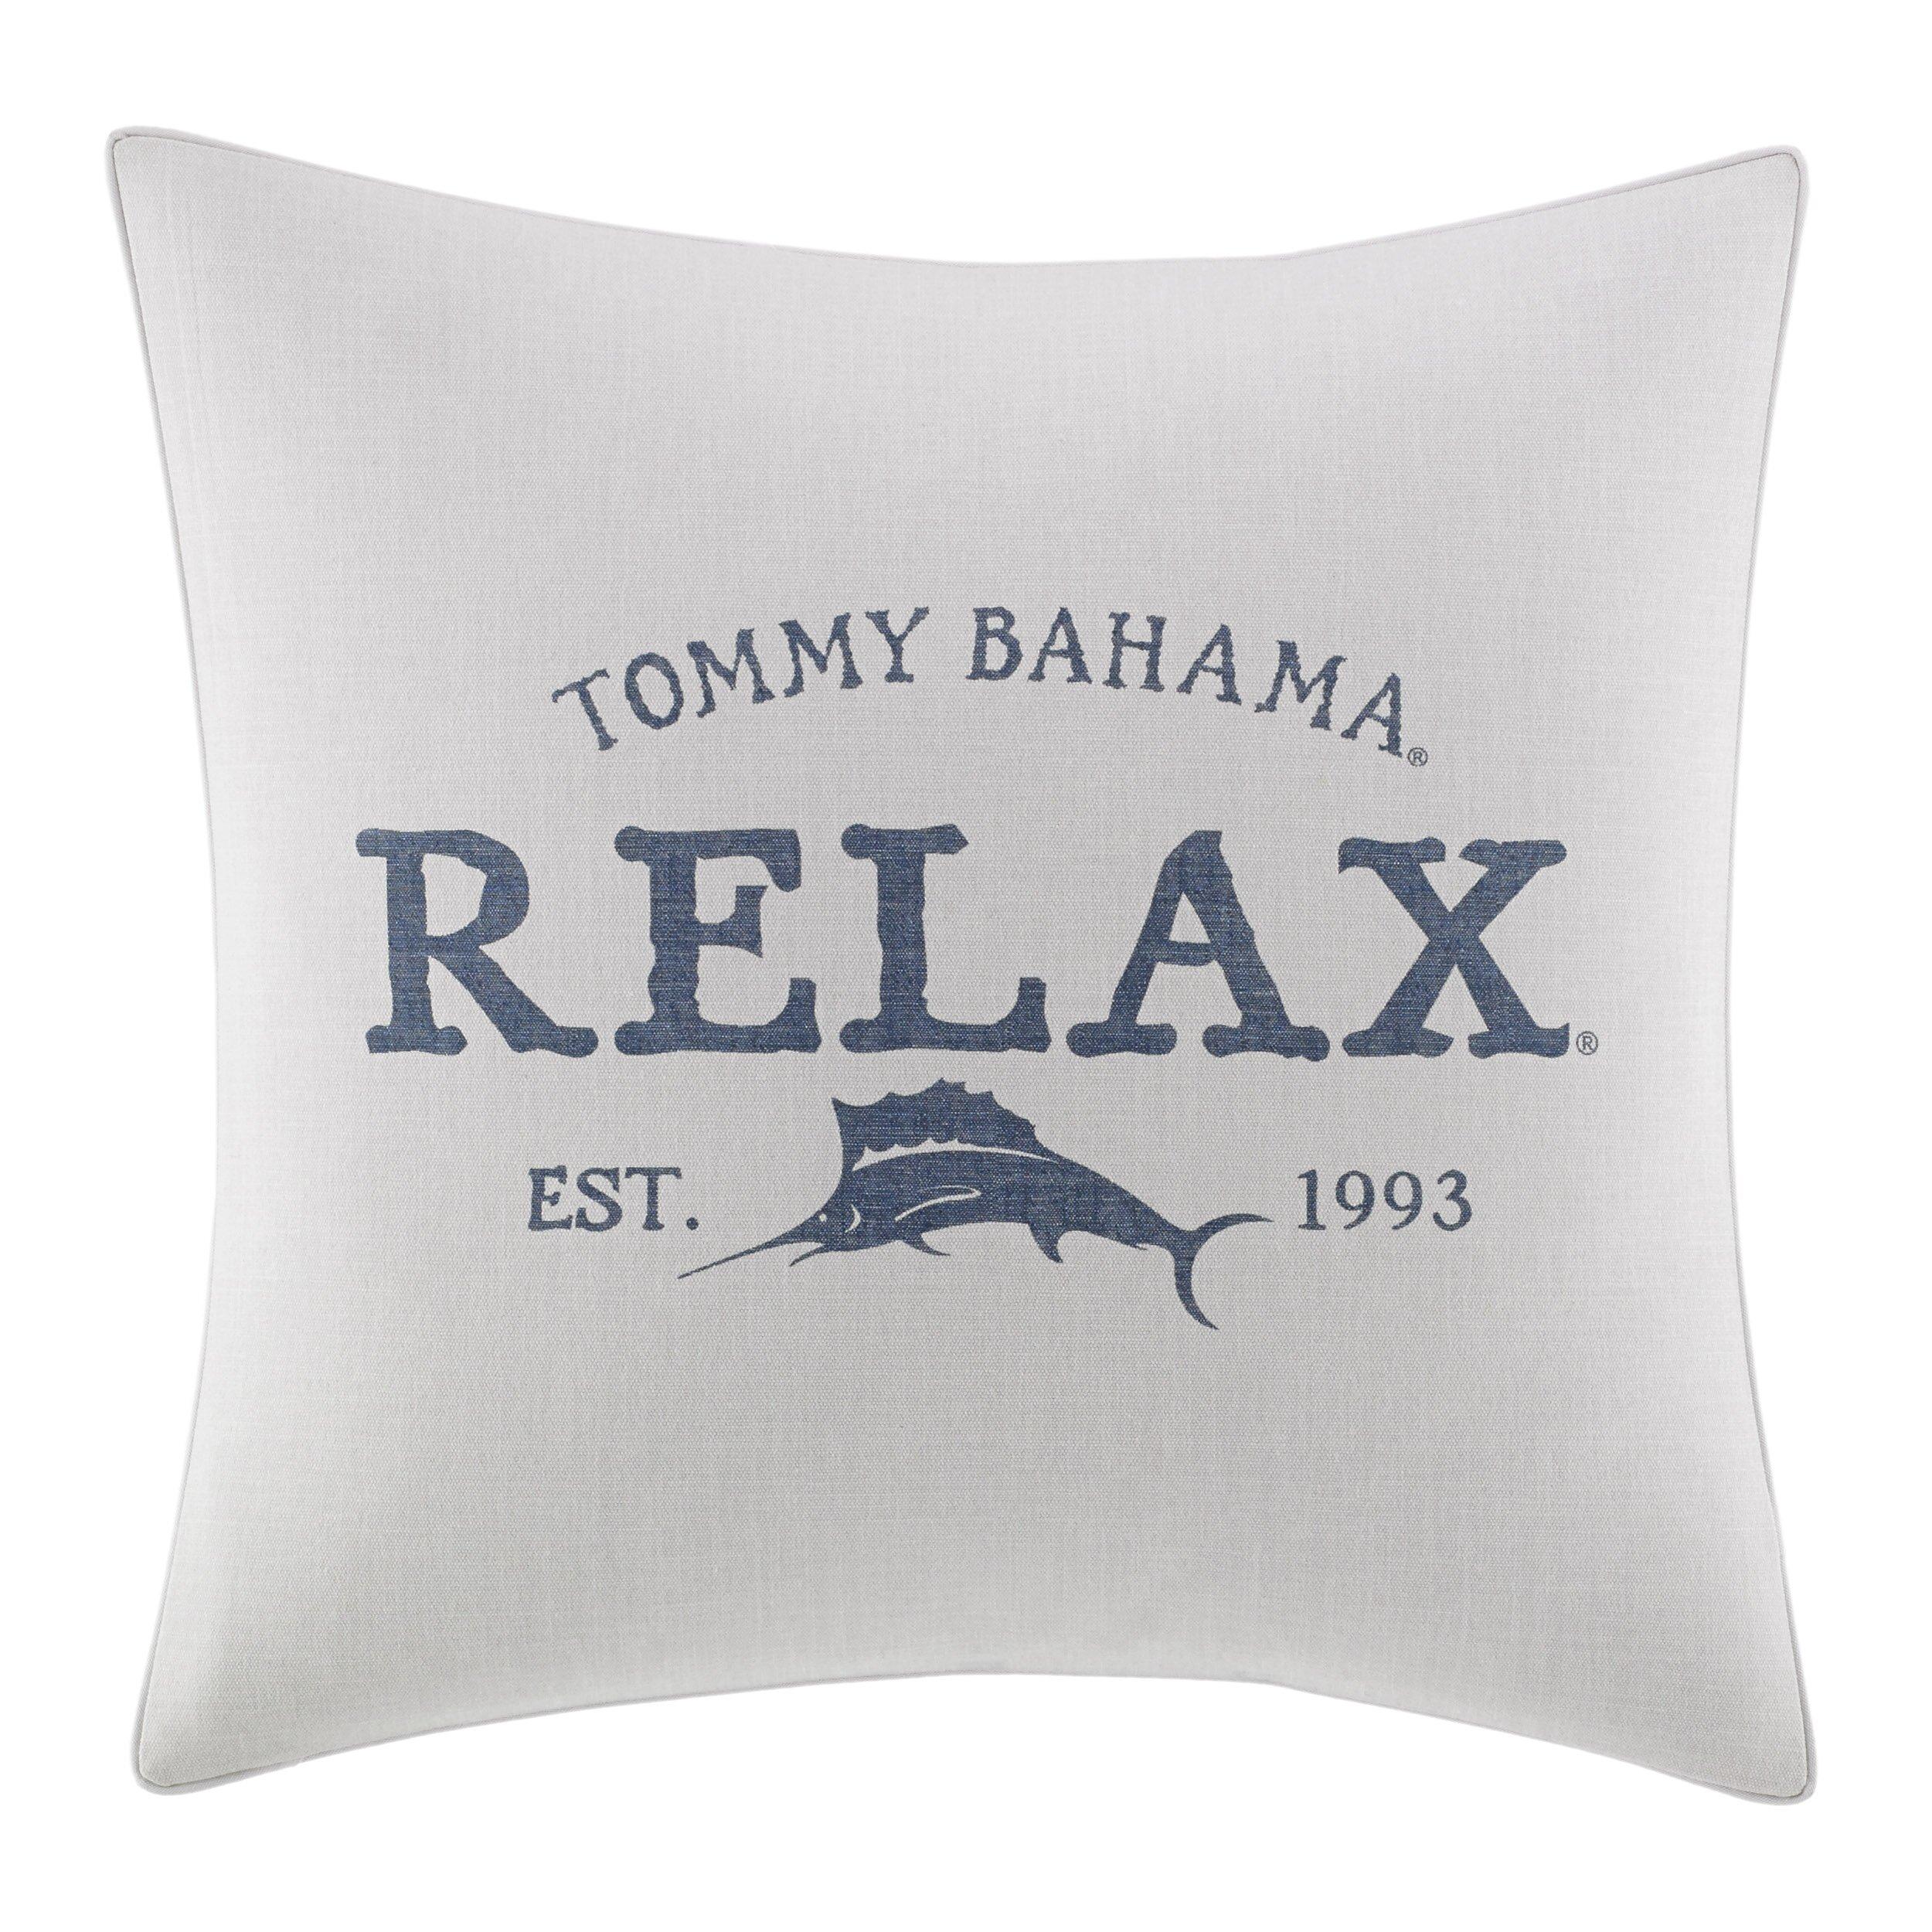 Throw Pillows That Say Relax : Raw Coast Relax Throw Pillow & Reviews Joss & Main